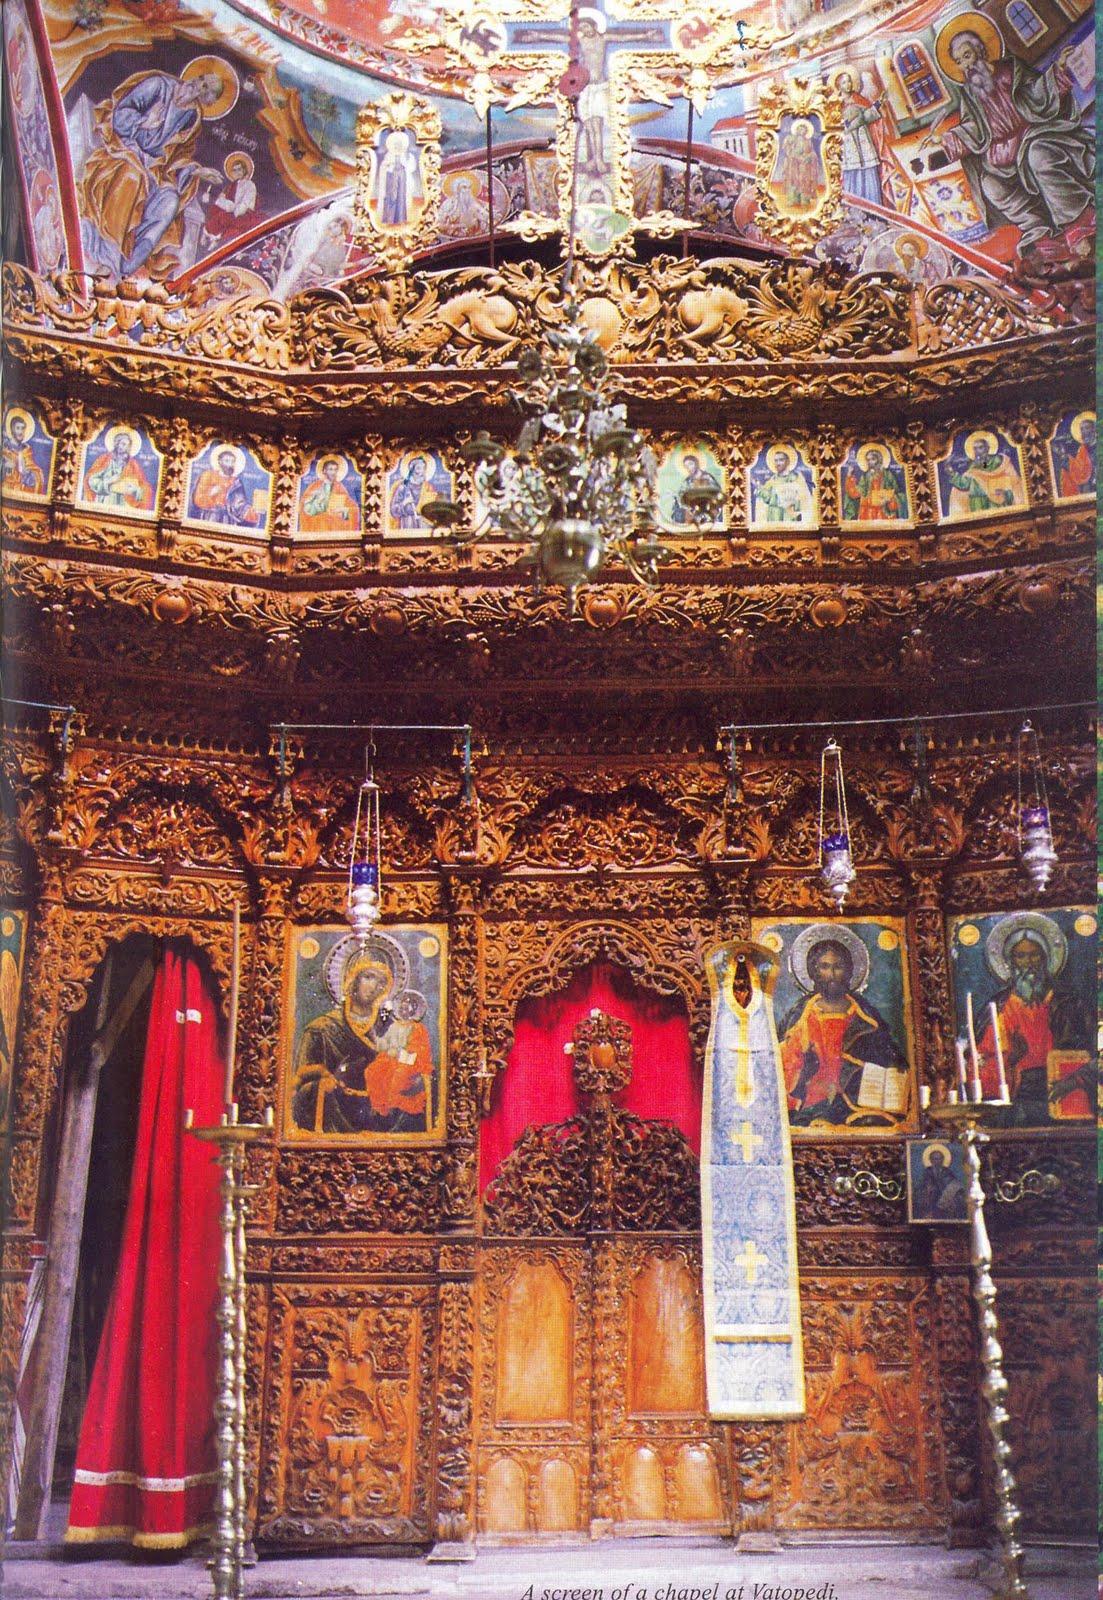 Mount Athos Chapel dans immagini sacre chapel_interior_vatopedi